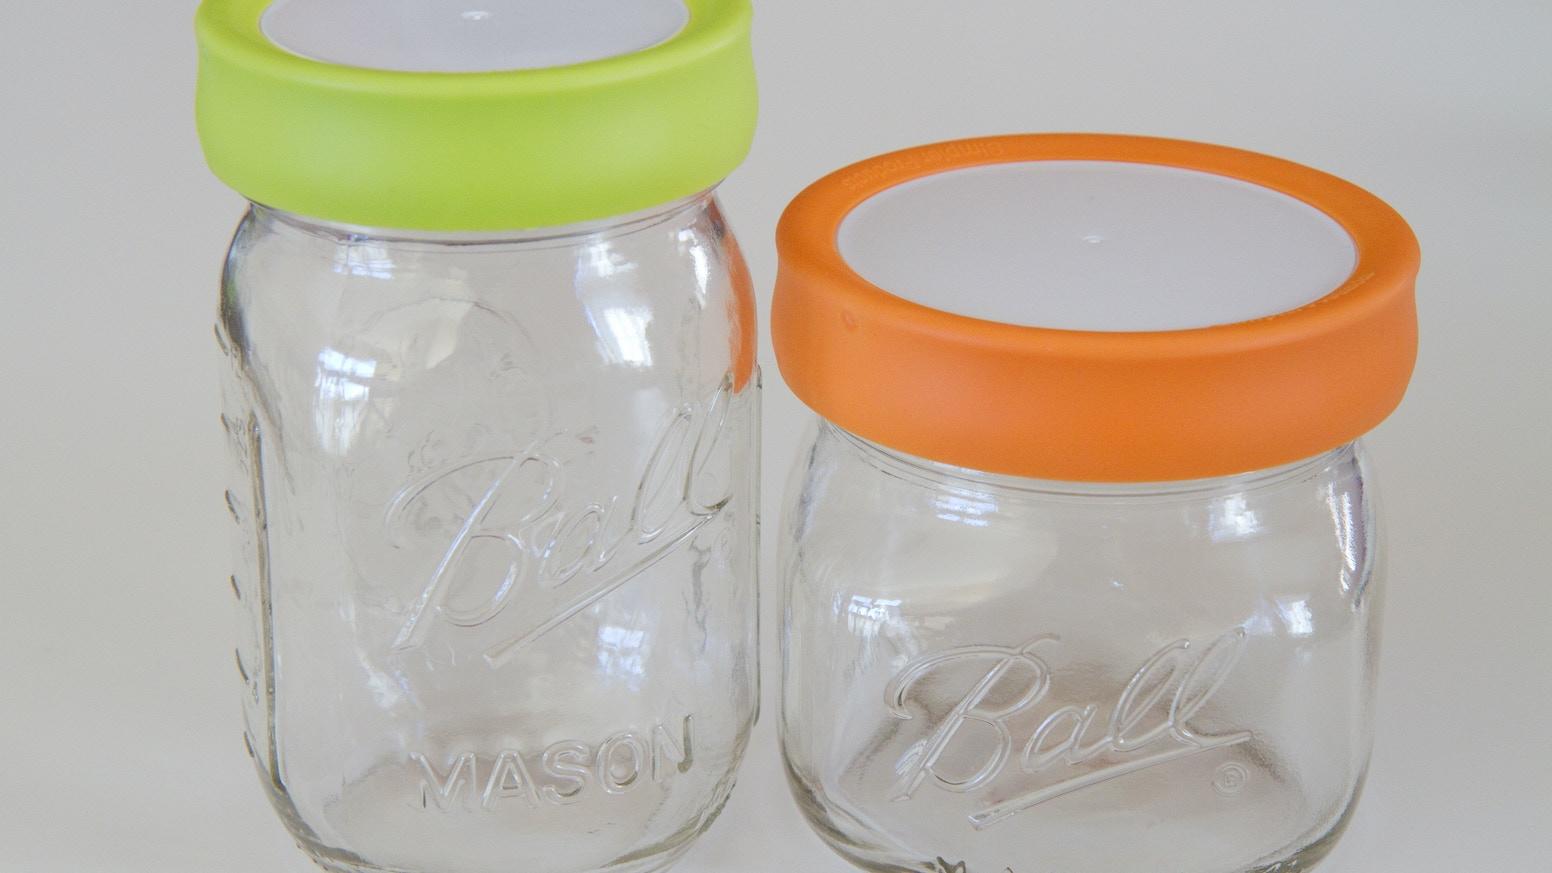 Tulid Reusable Mason Jar Lid By Simpler Products Kickstarter